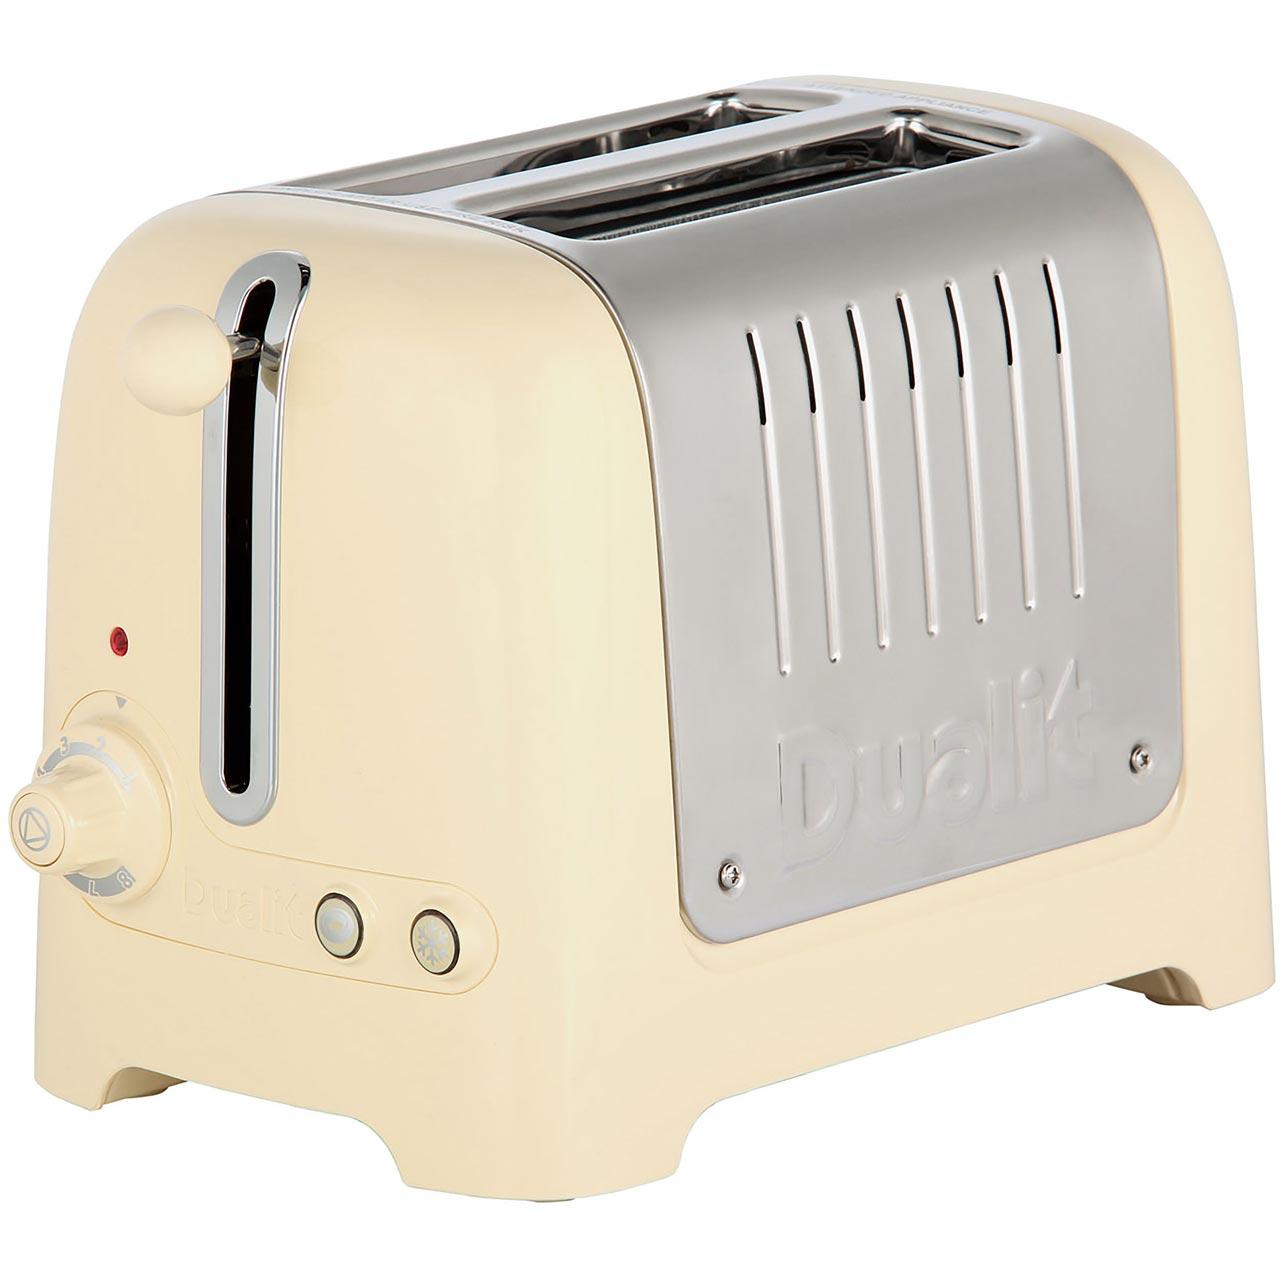 Dualit Lite 2 Slice Toaster Gloss Cream